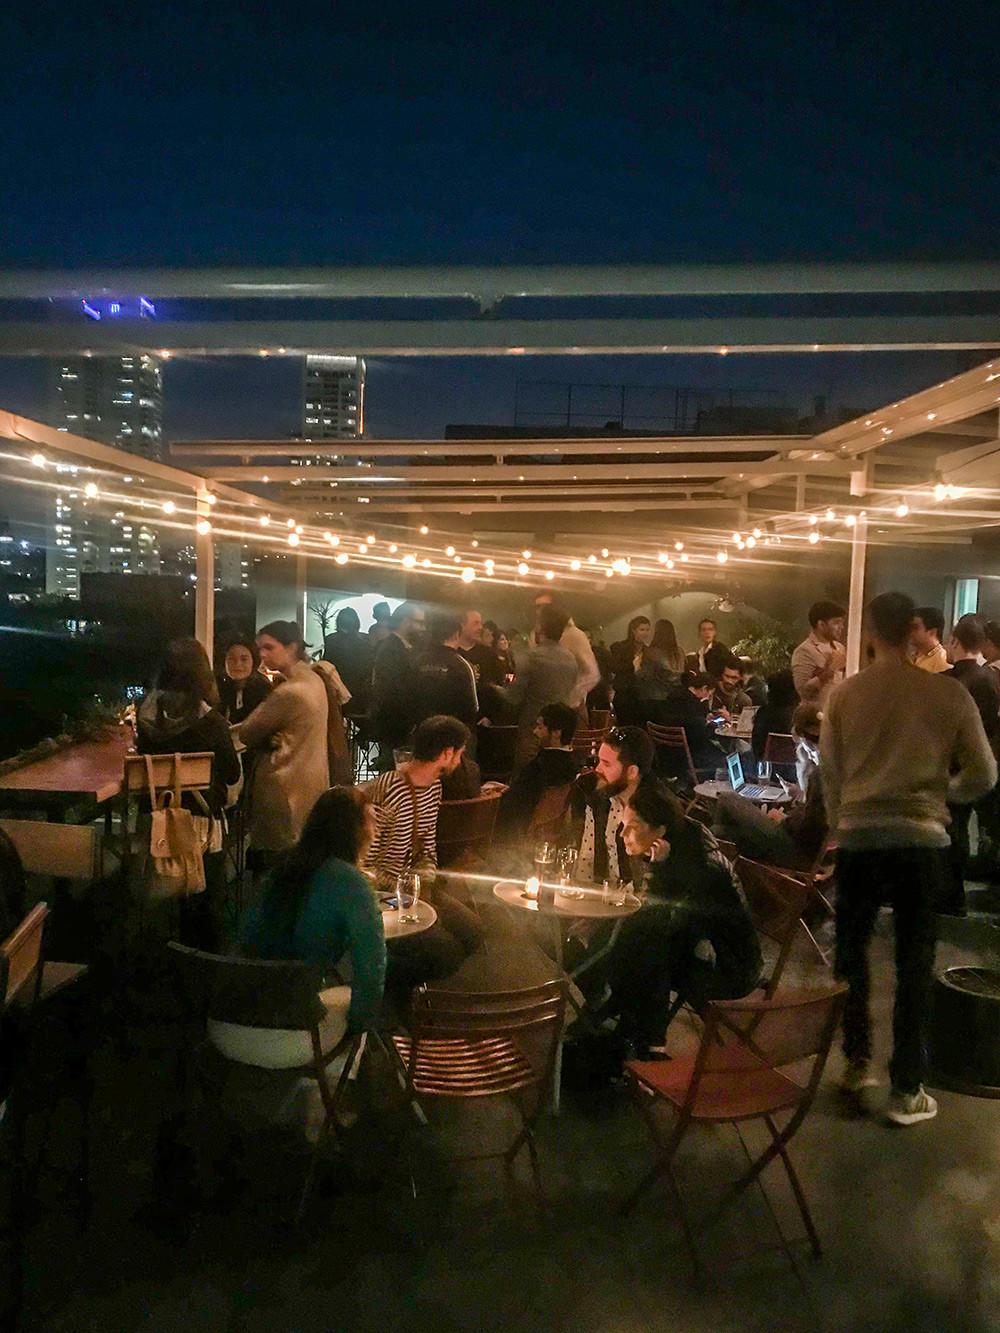 Selina_RoofBar_Turista_BuenosAires_Rooftop_Bar